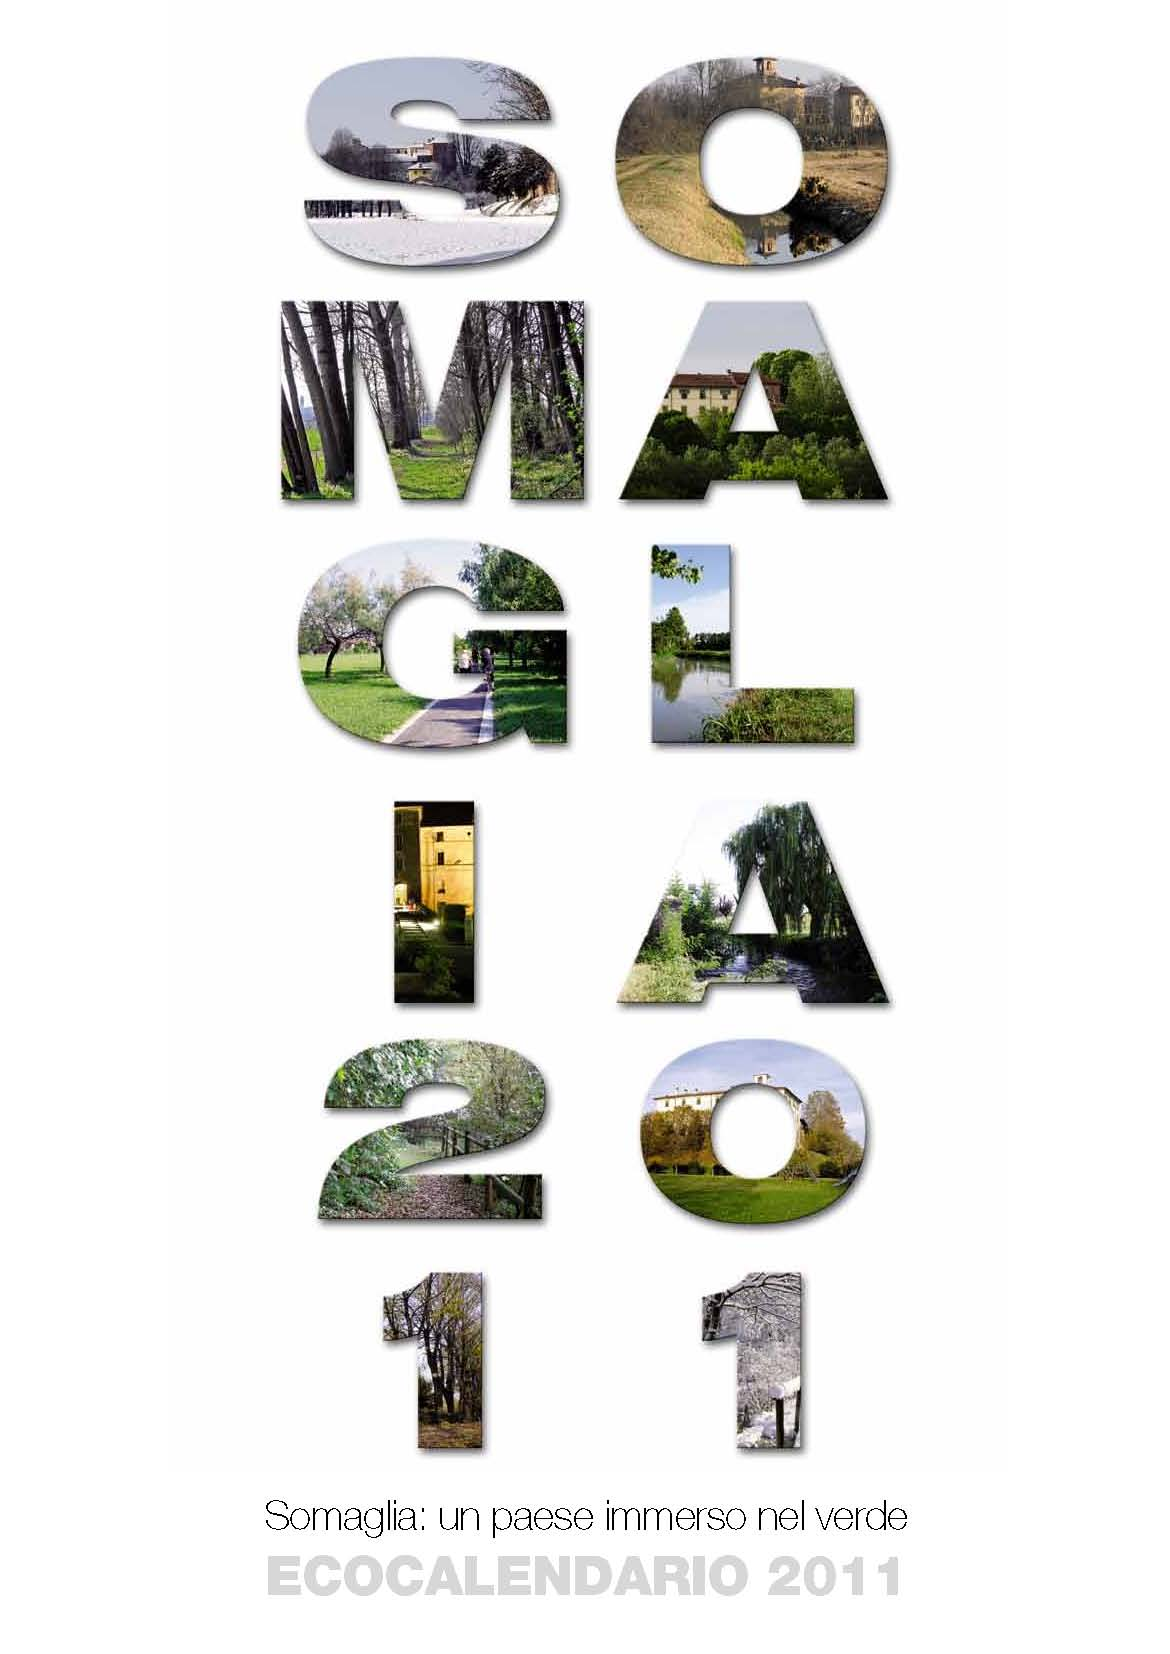 Pagine da ECOCALENDARIO 2011